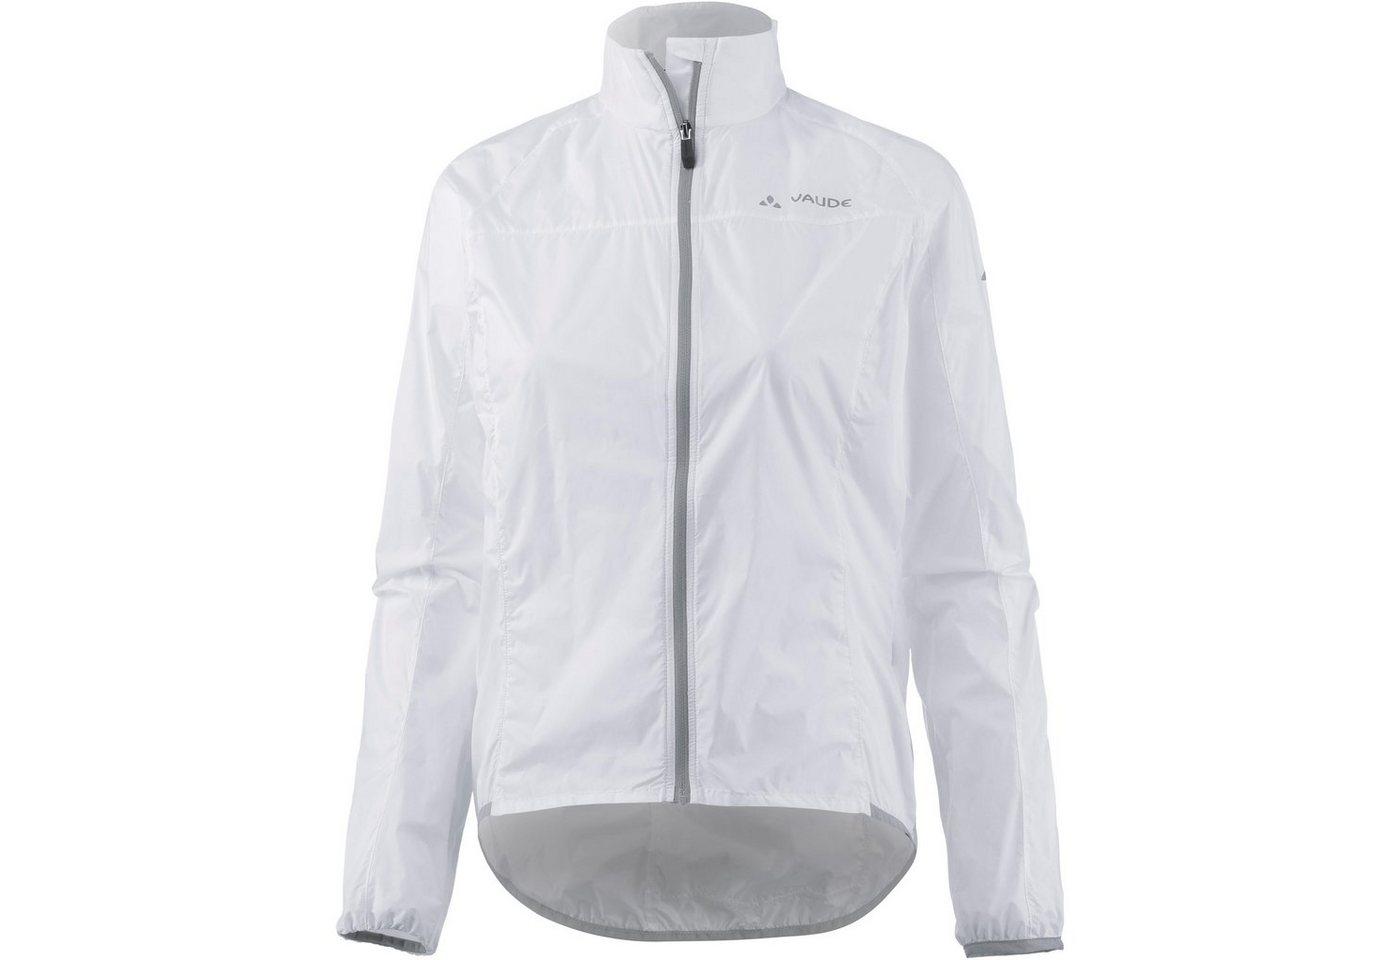 VAUDE Fahrradjacke »Air III« | Sportbekleidung > Sportjacken > Fahrradjacken | Weiß | Polyamid | VAUDE